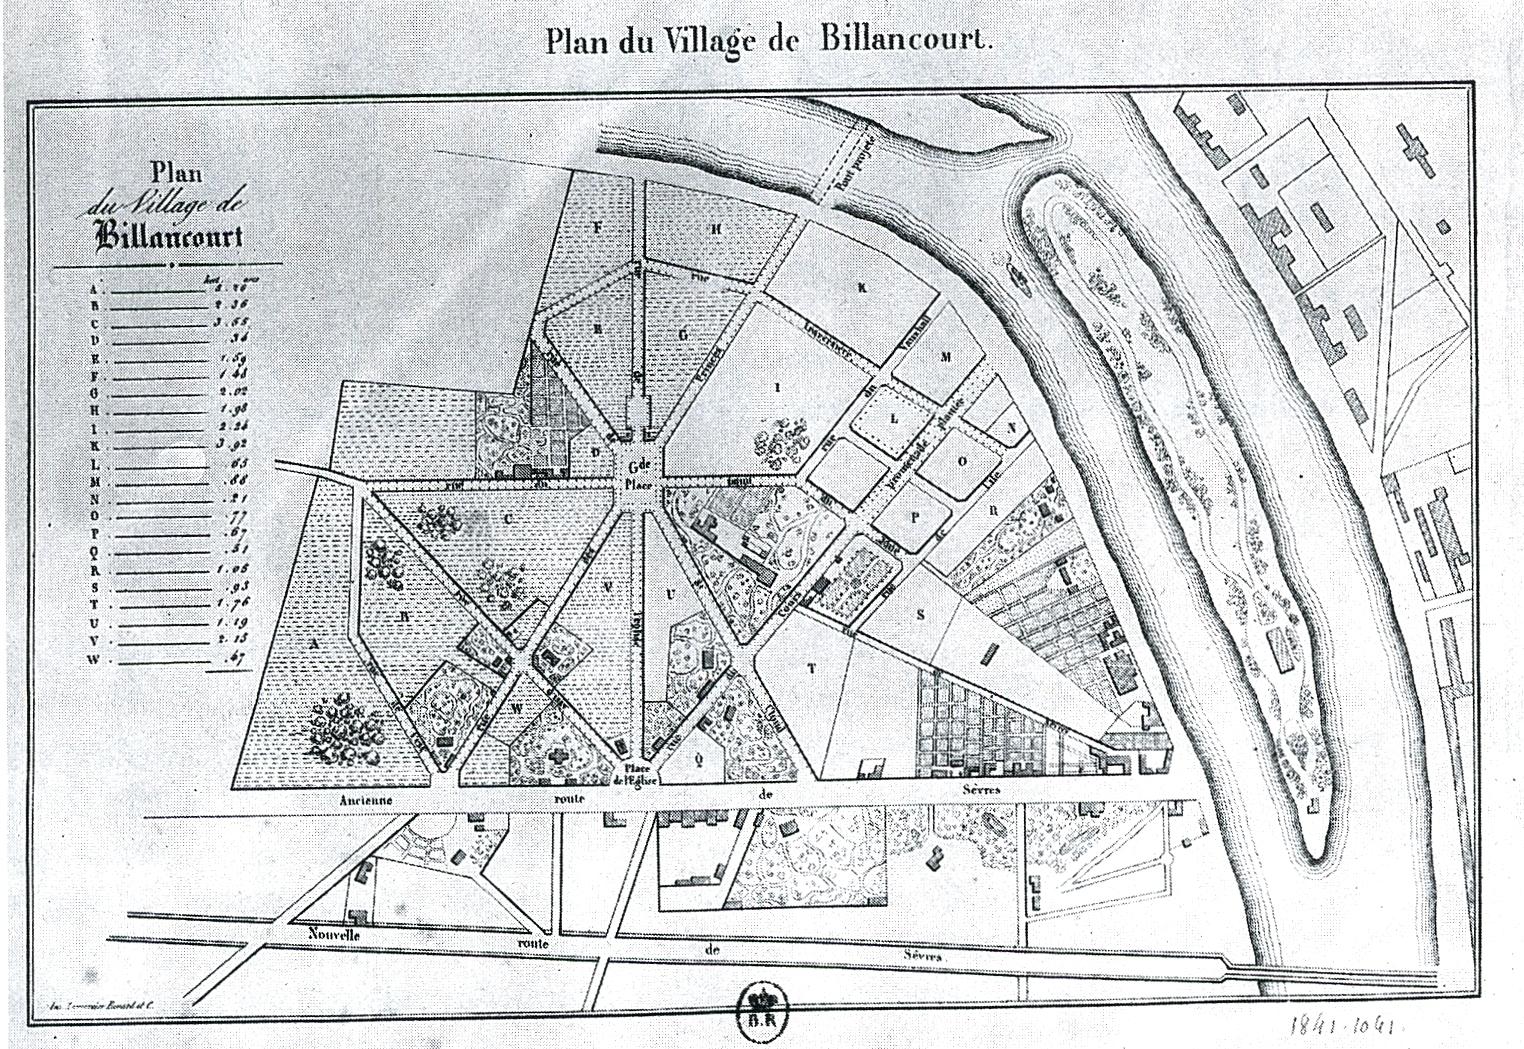 Plan du Village de Billancourt 1834